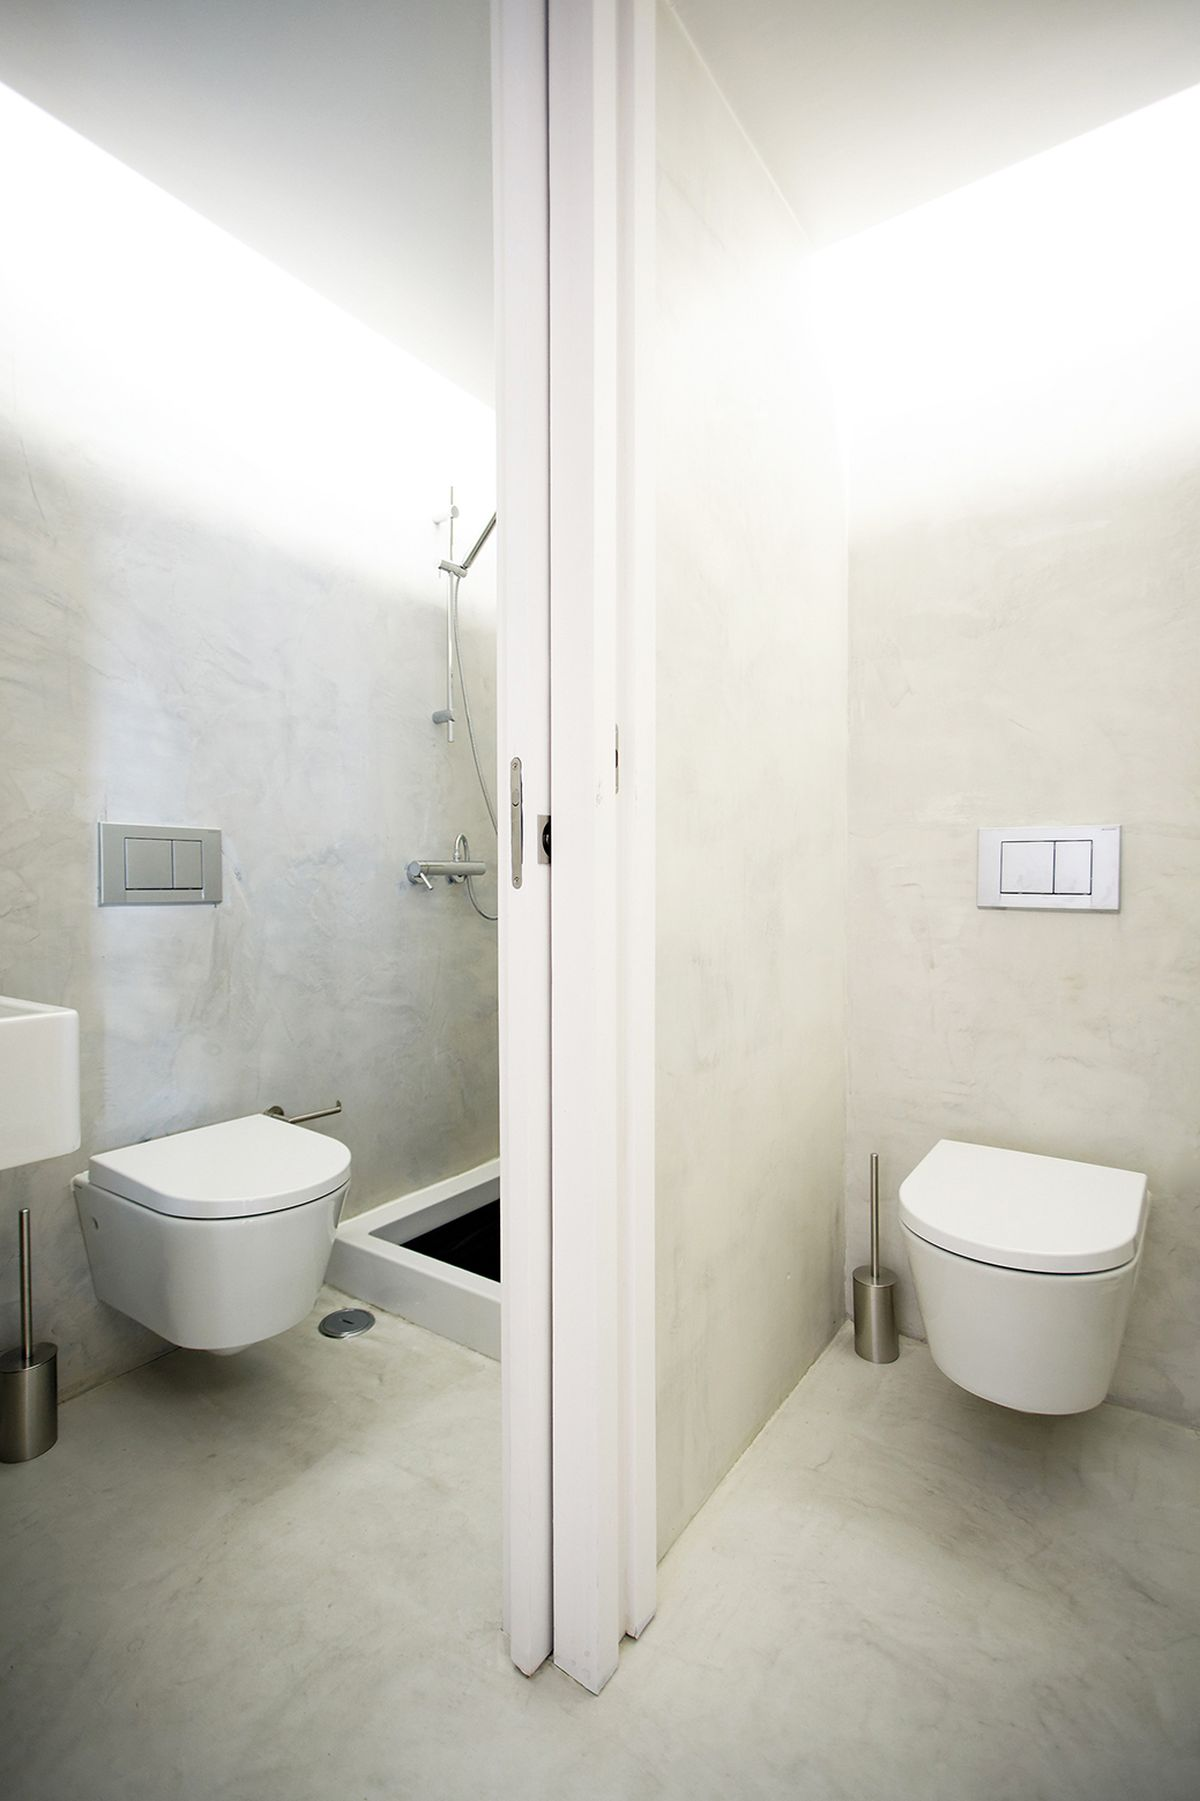 lisbon-student-apartment-bathroom-configuration